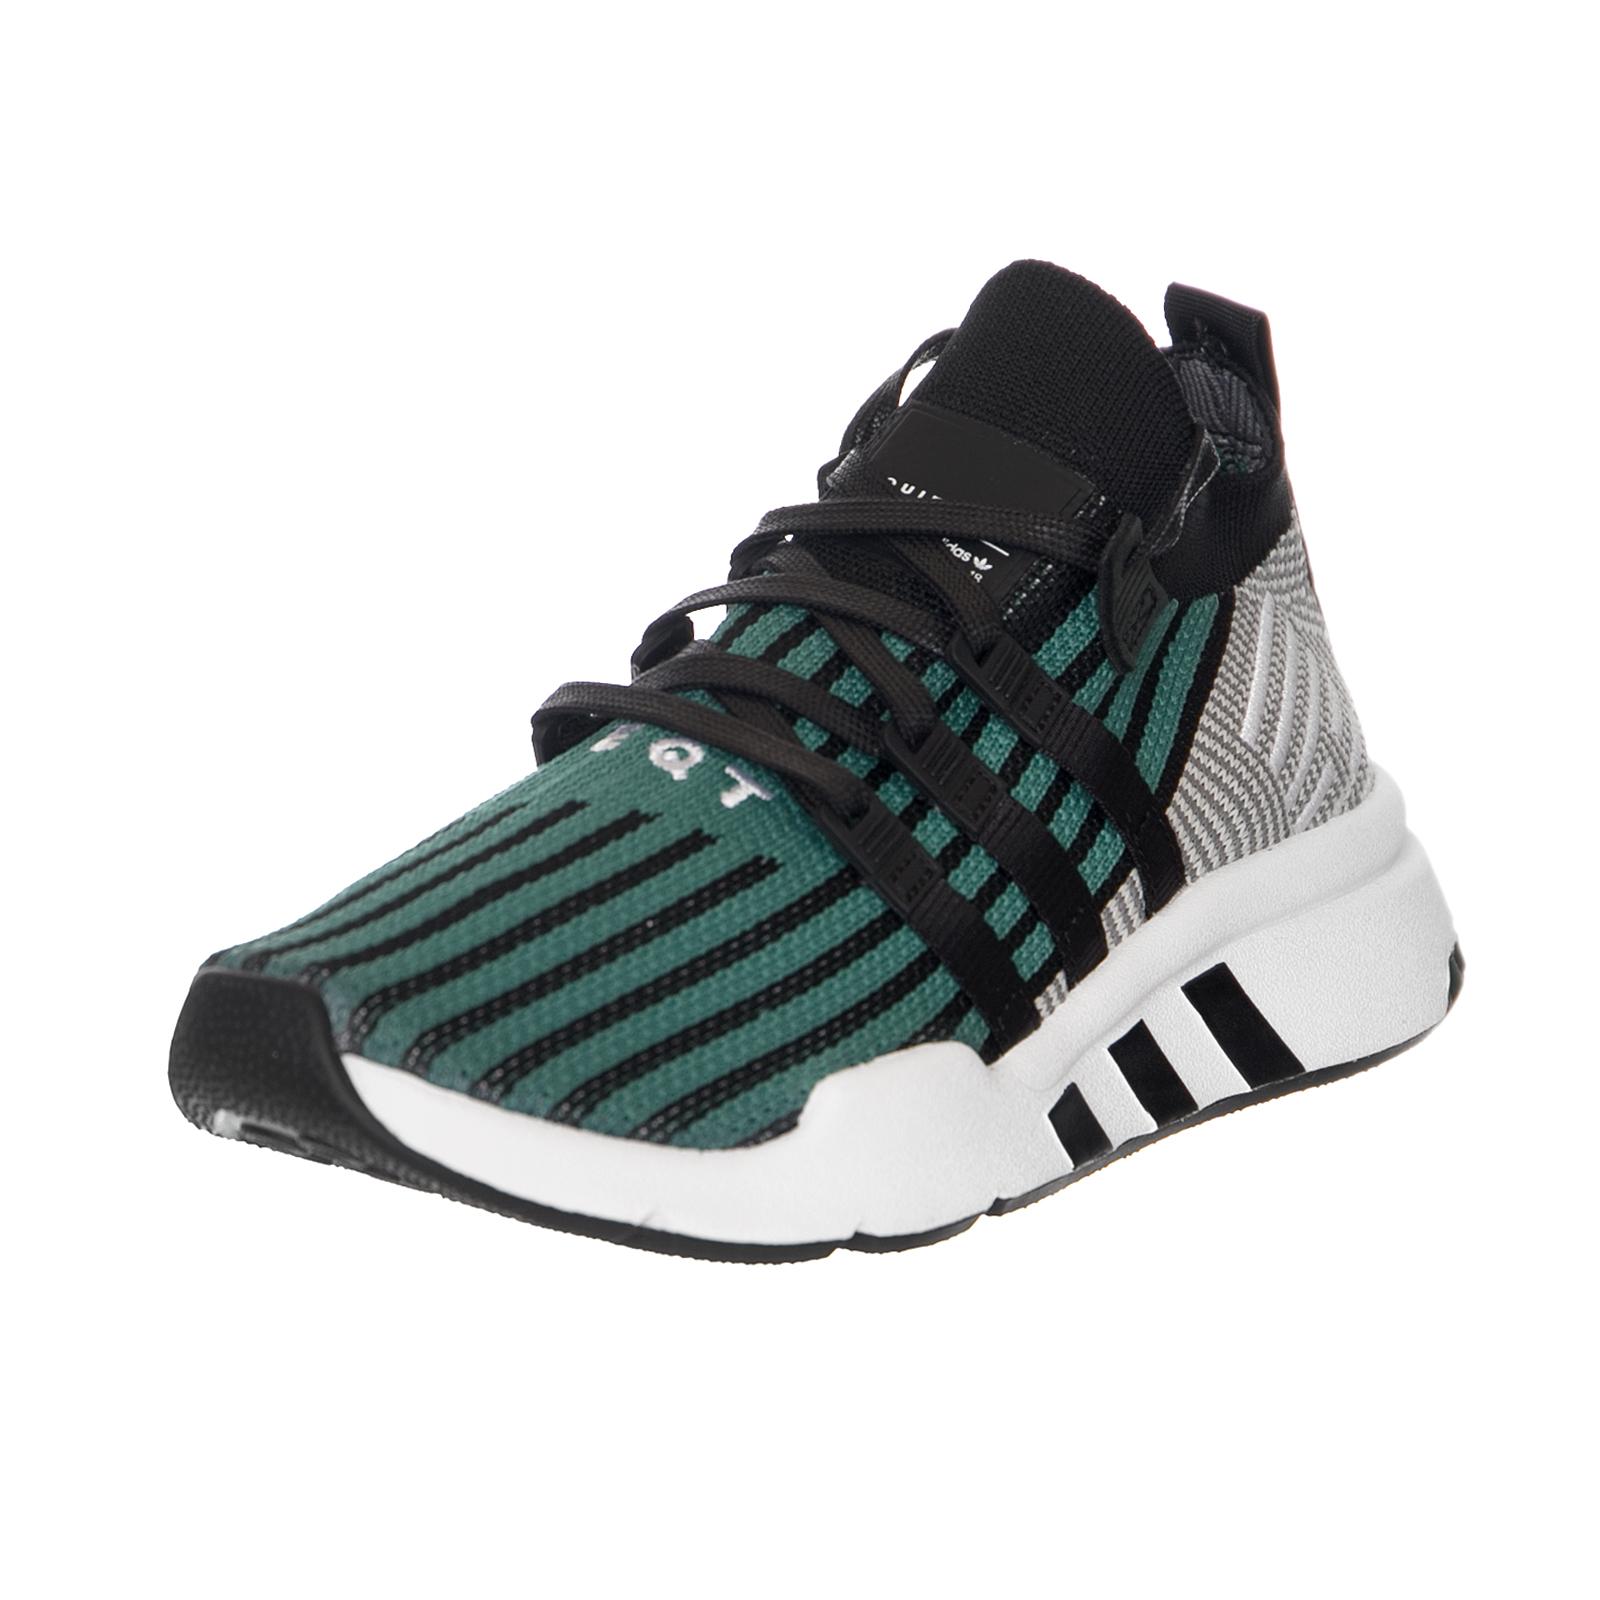 Adidas Sneakers Eqt Support Mid Adv Black / Black / Green Black